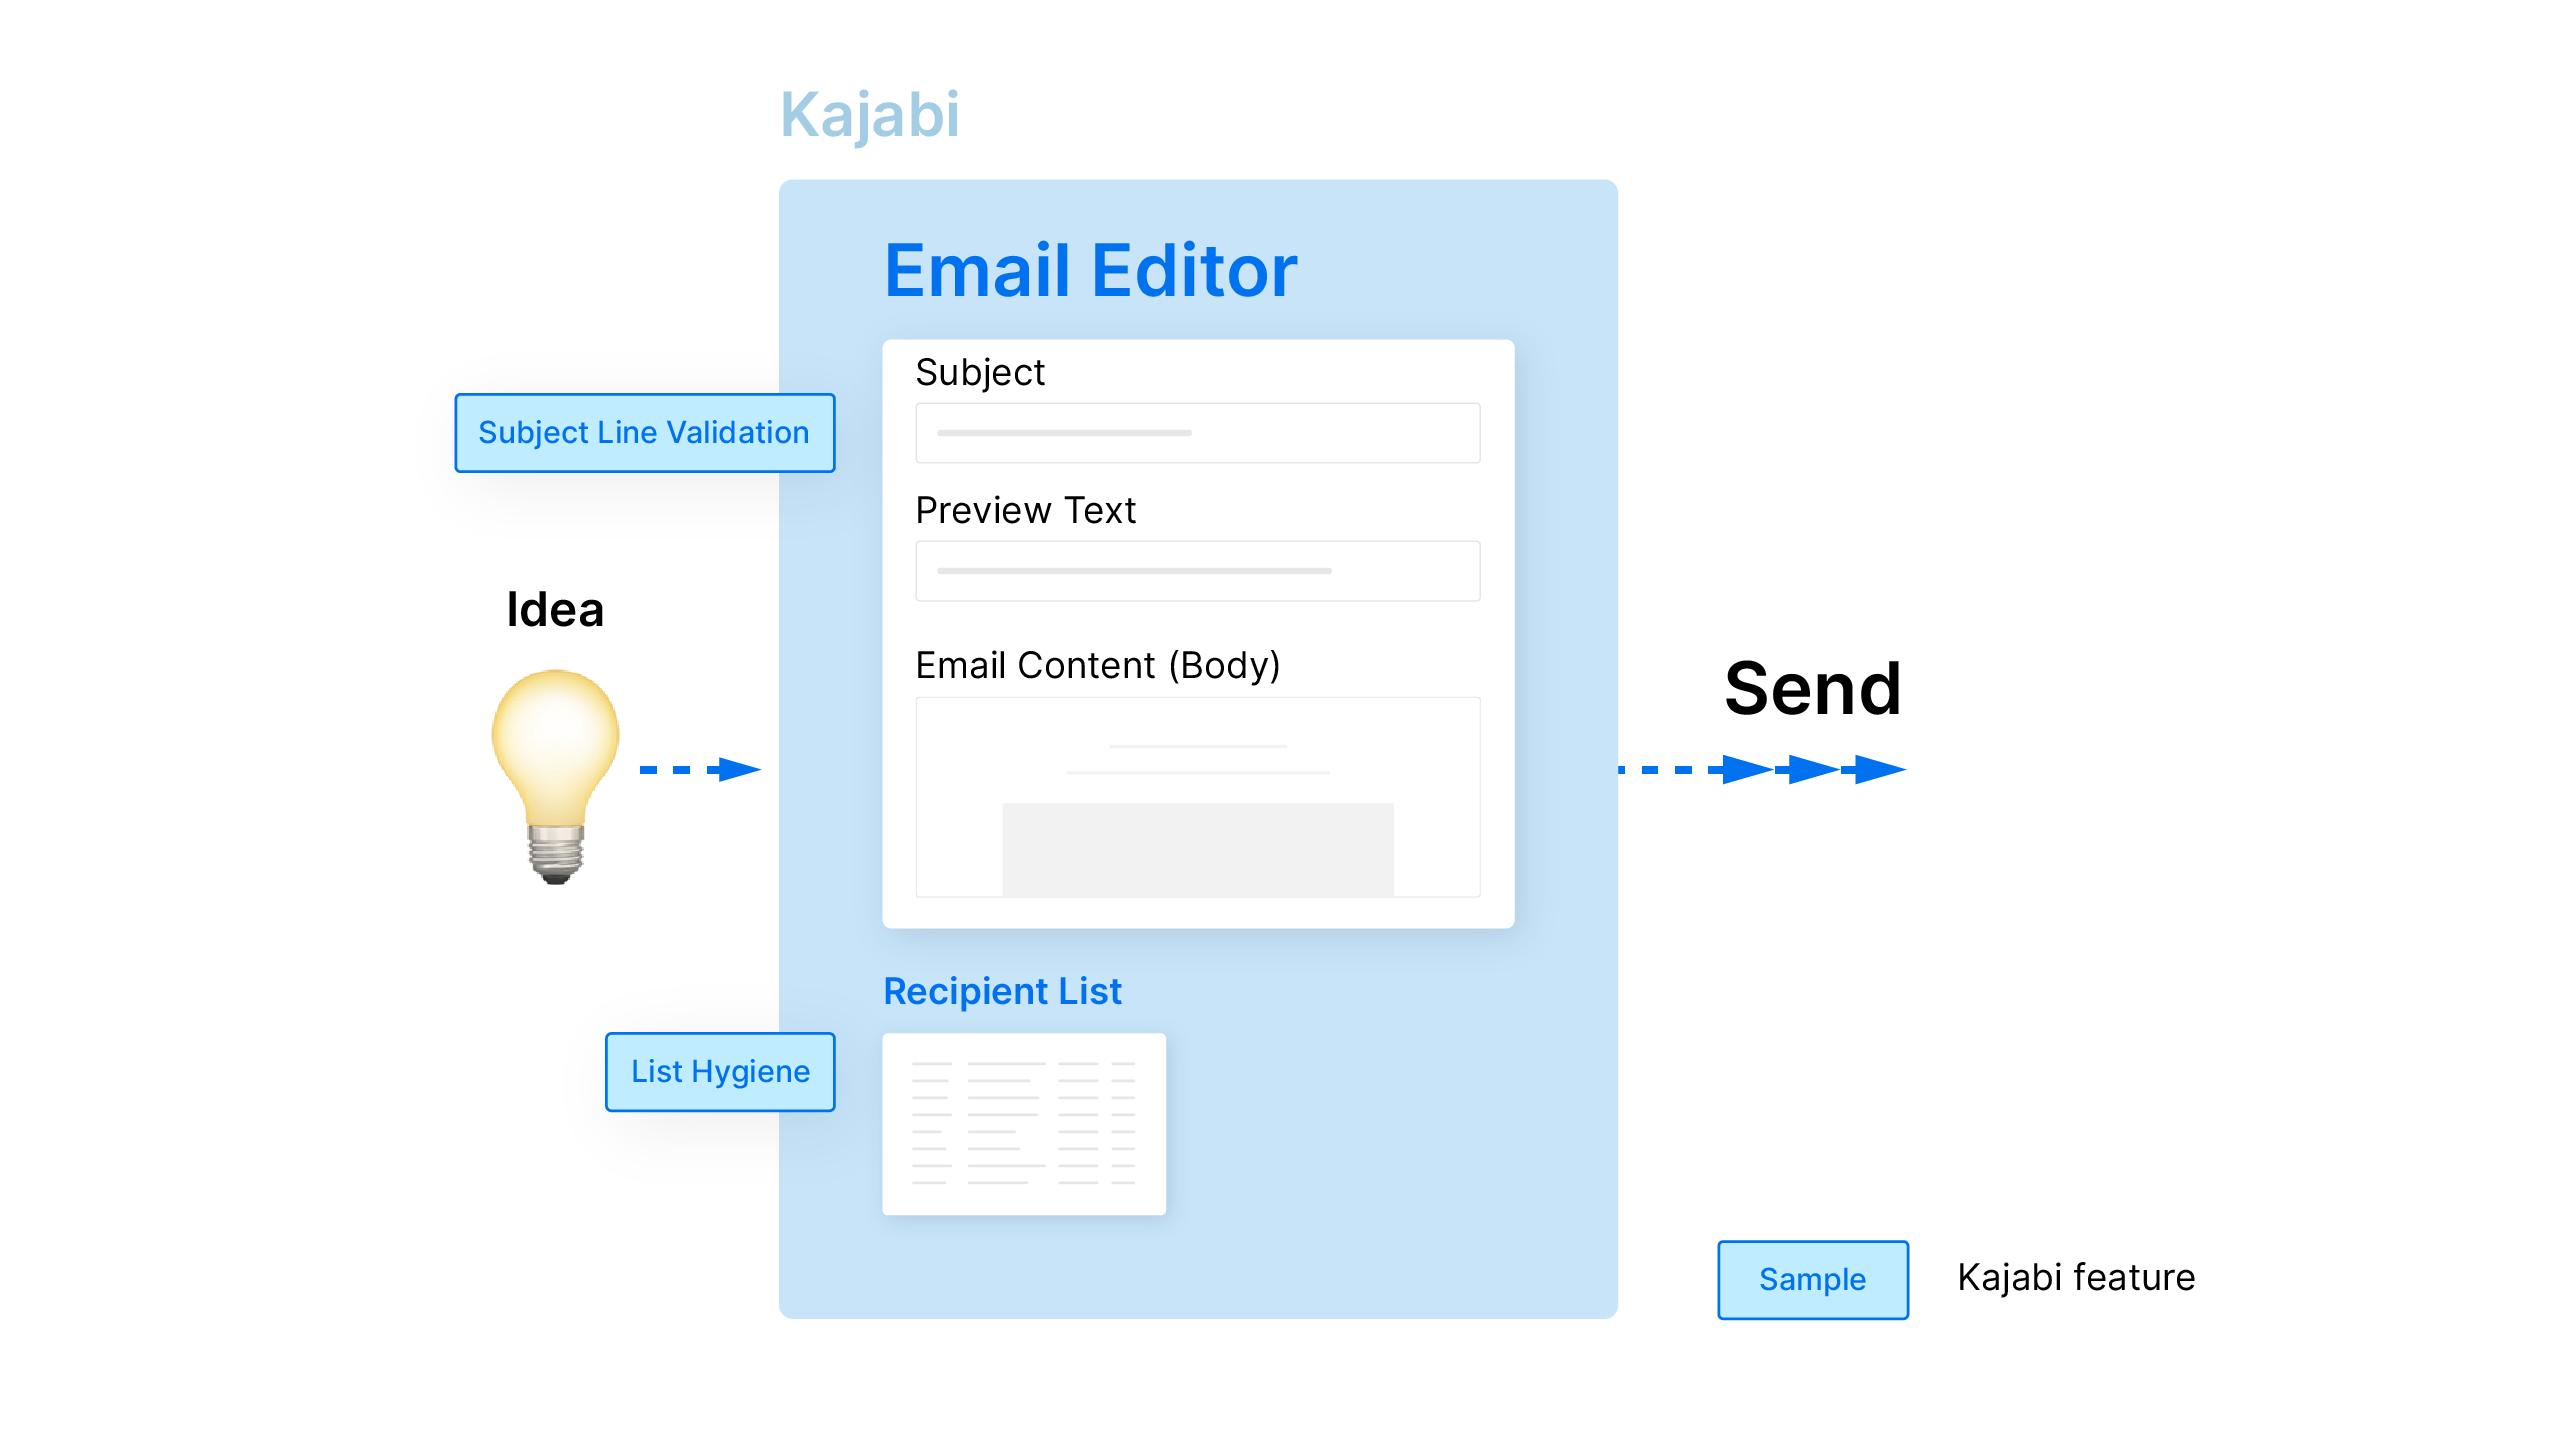 Kajabi Email Editor